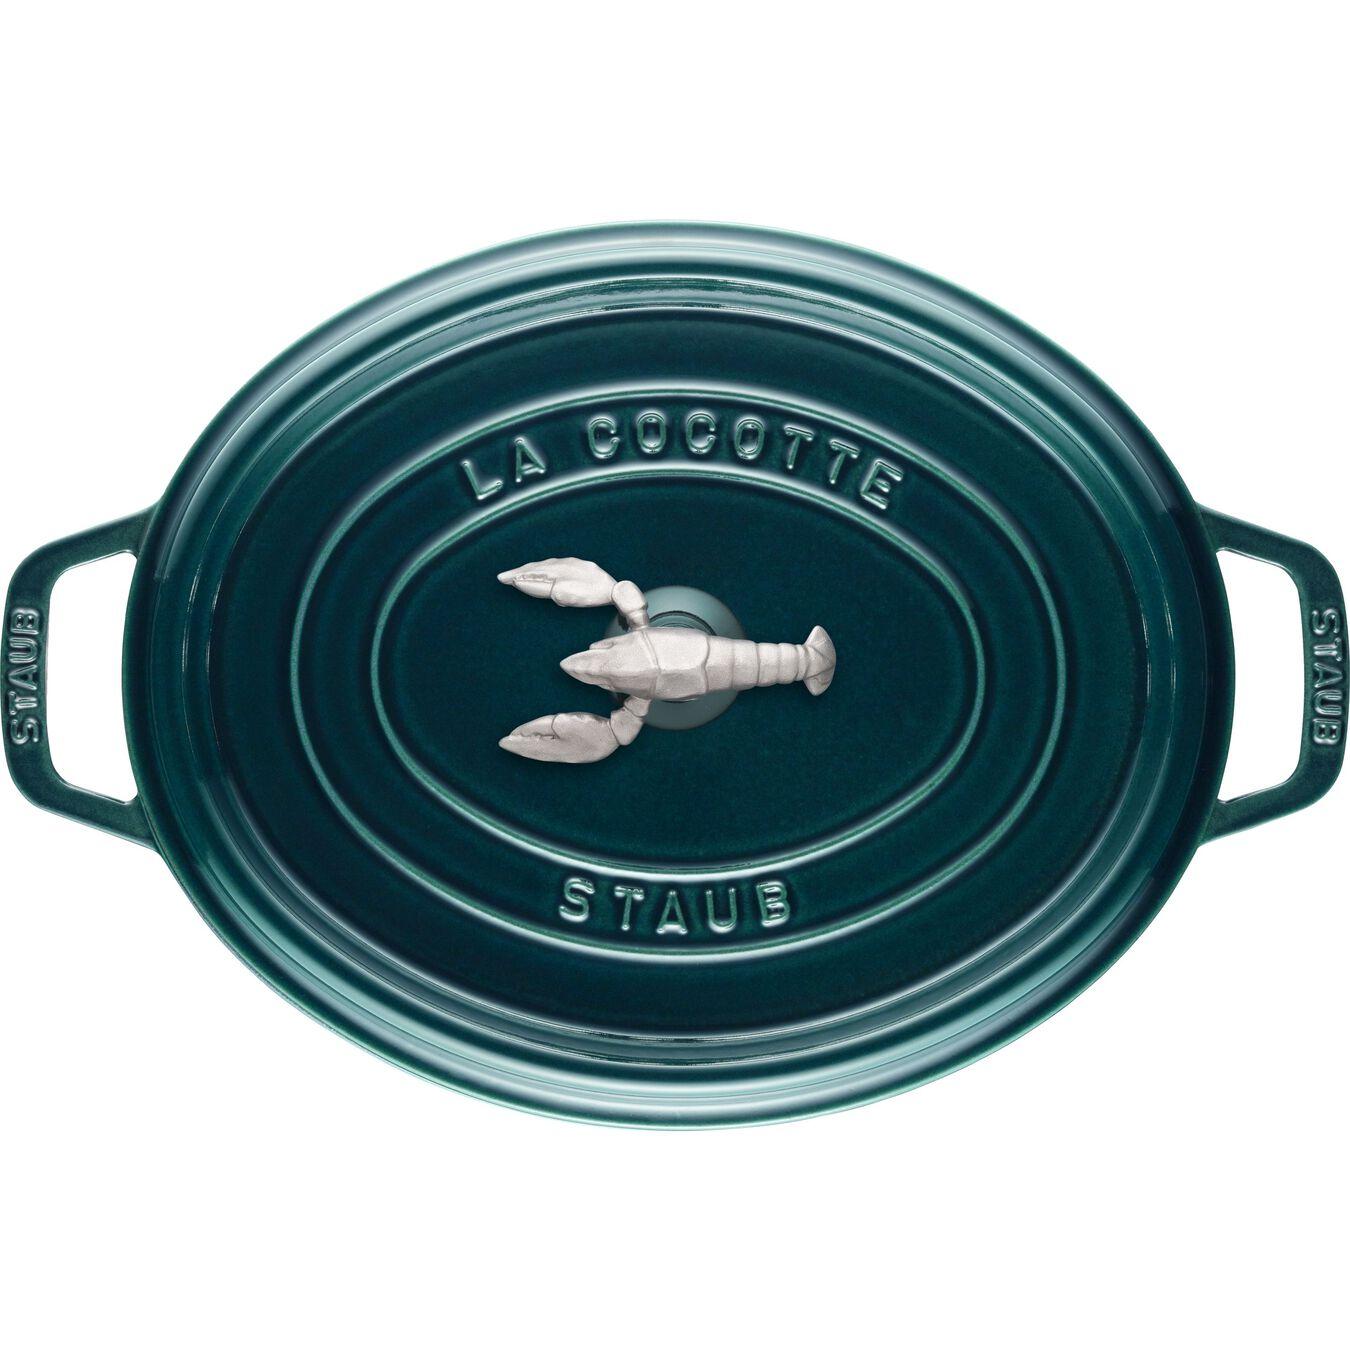 Cocotte bouton homard 31 cm, Ovale, La-Mer, Fonte,,large 3